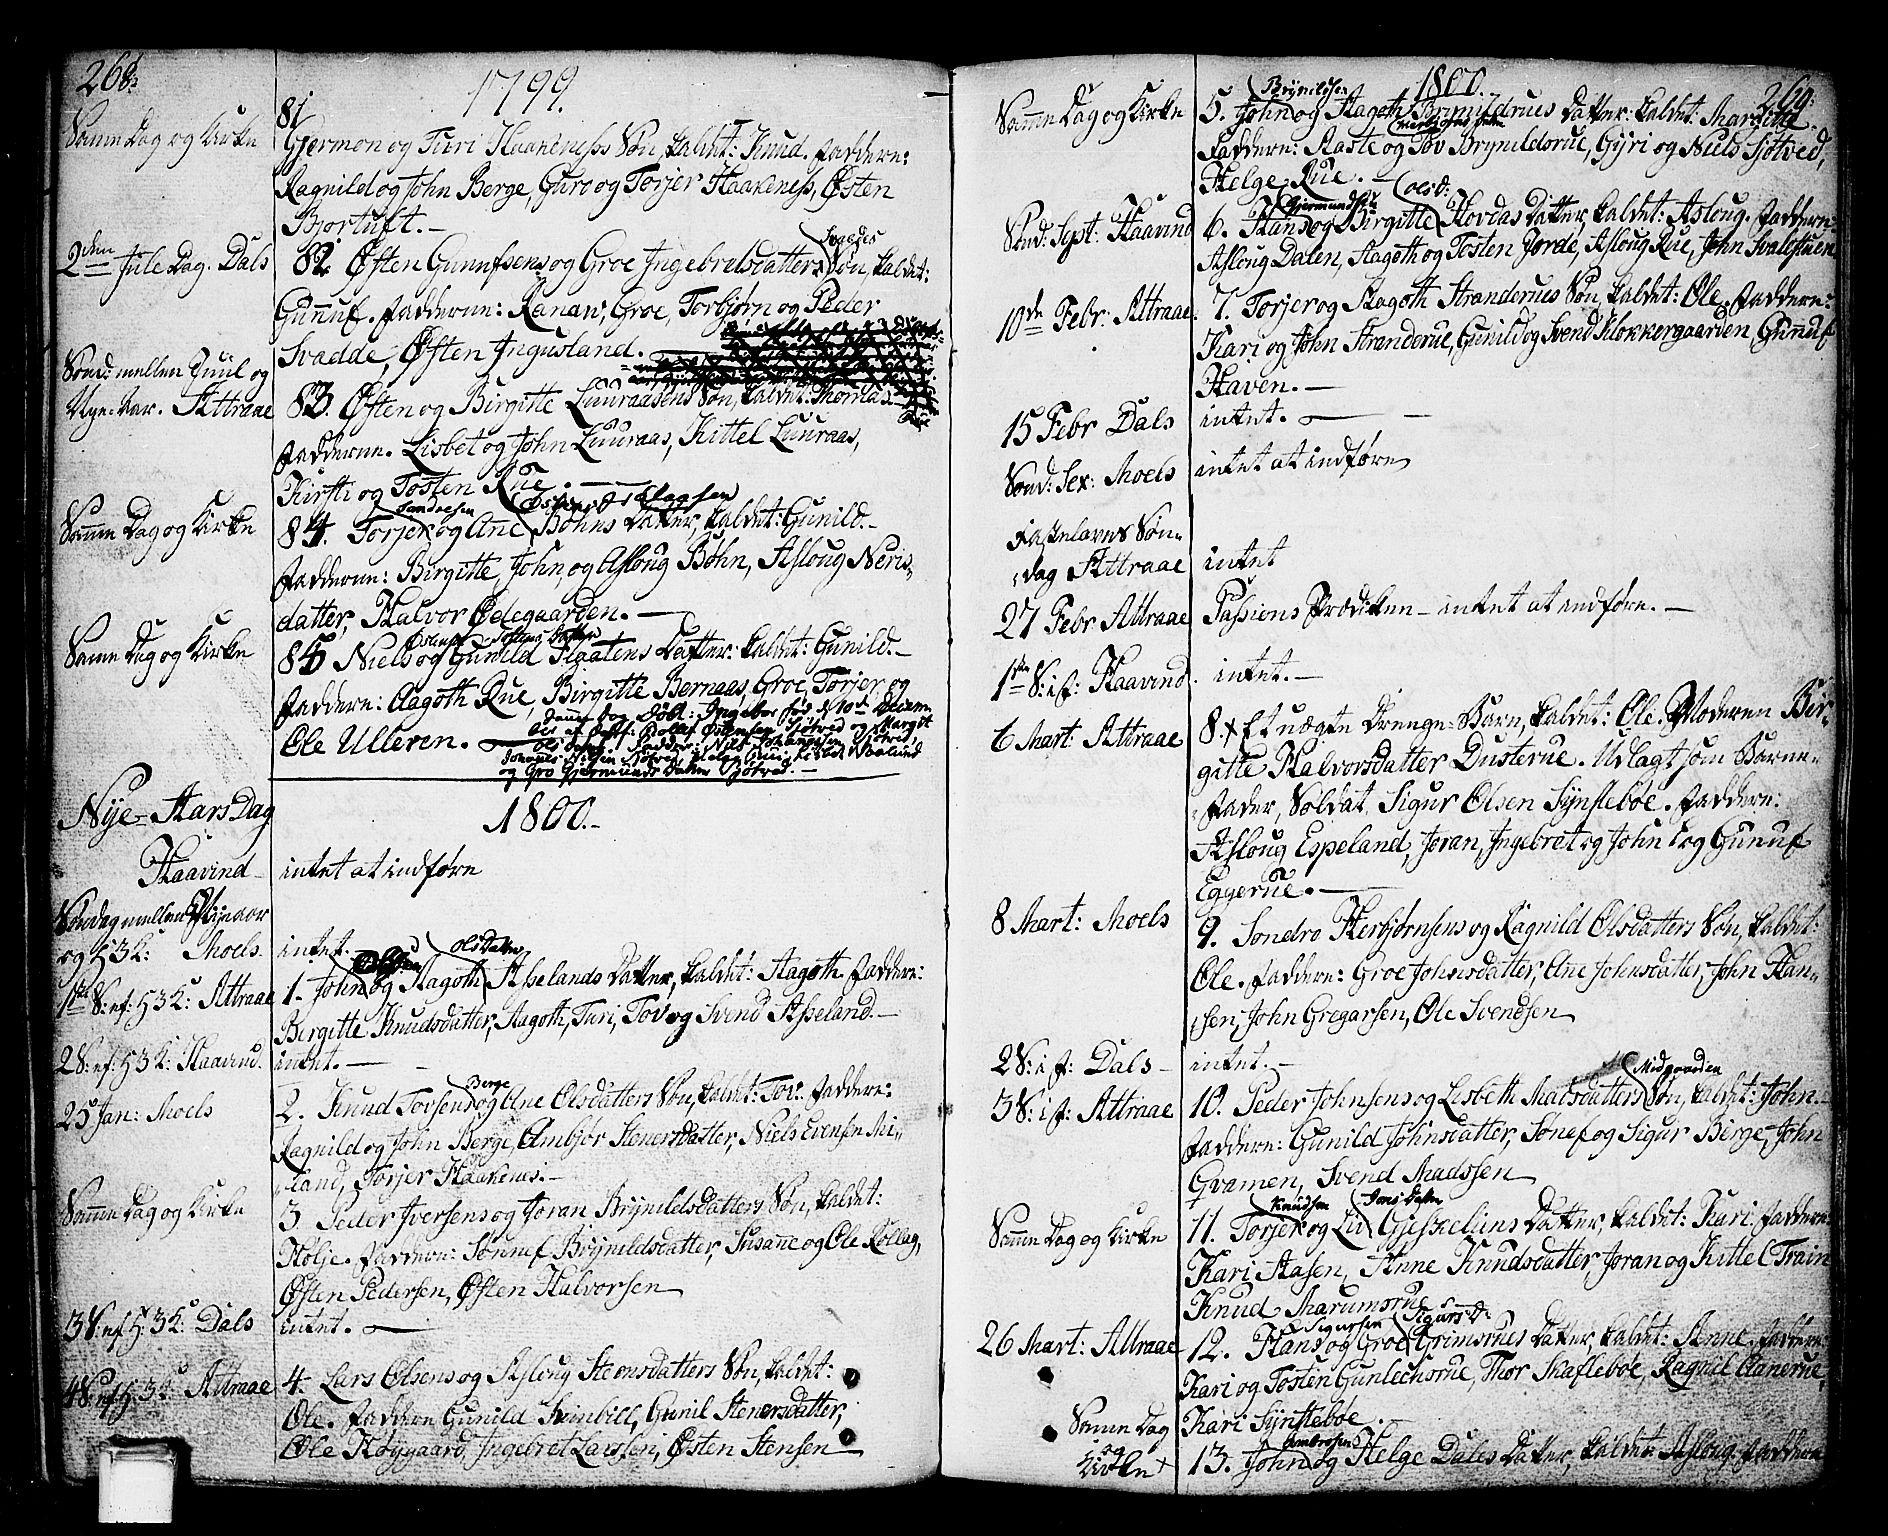 SAKO, Tinn kirkebøker, F/Fa/L0002: Ministerialbok nr. I 2, 1757-1810, s. 268-269